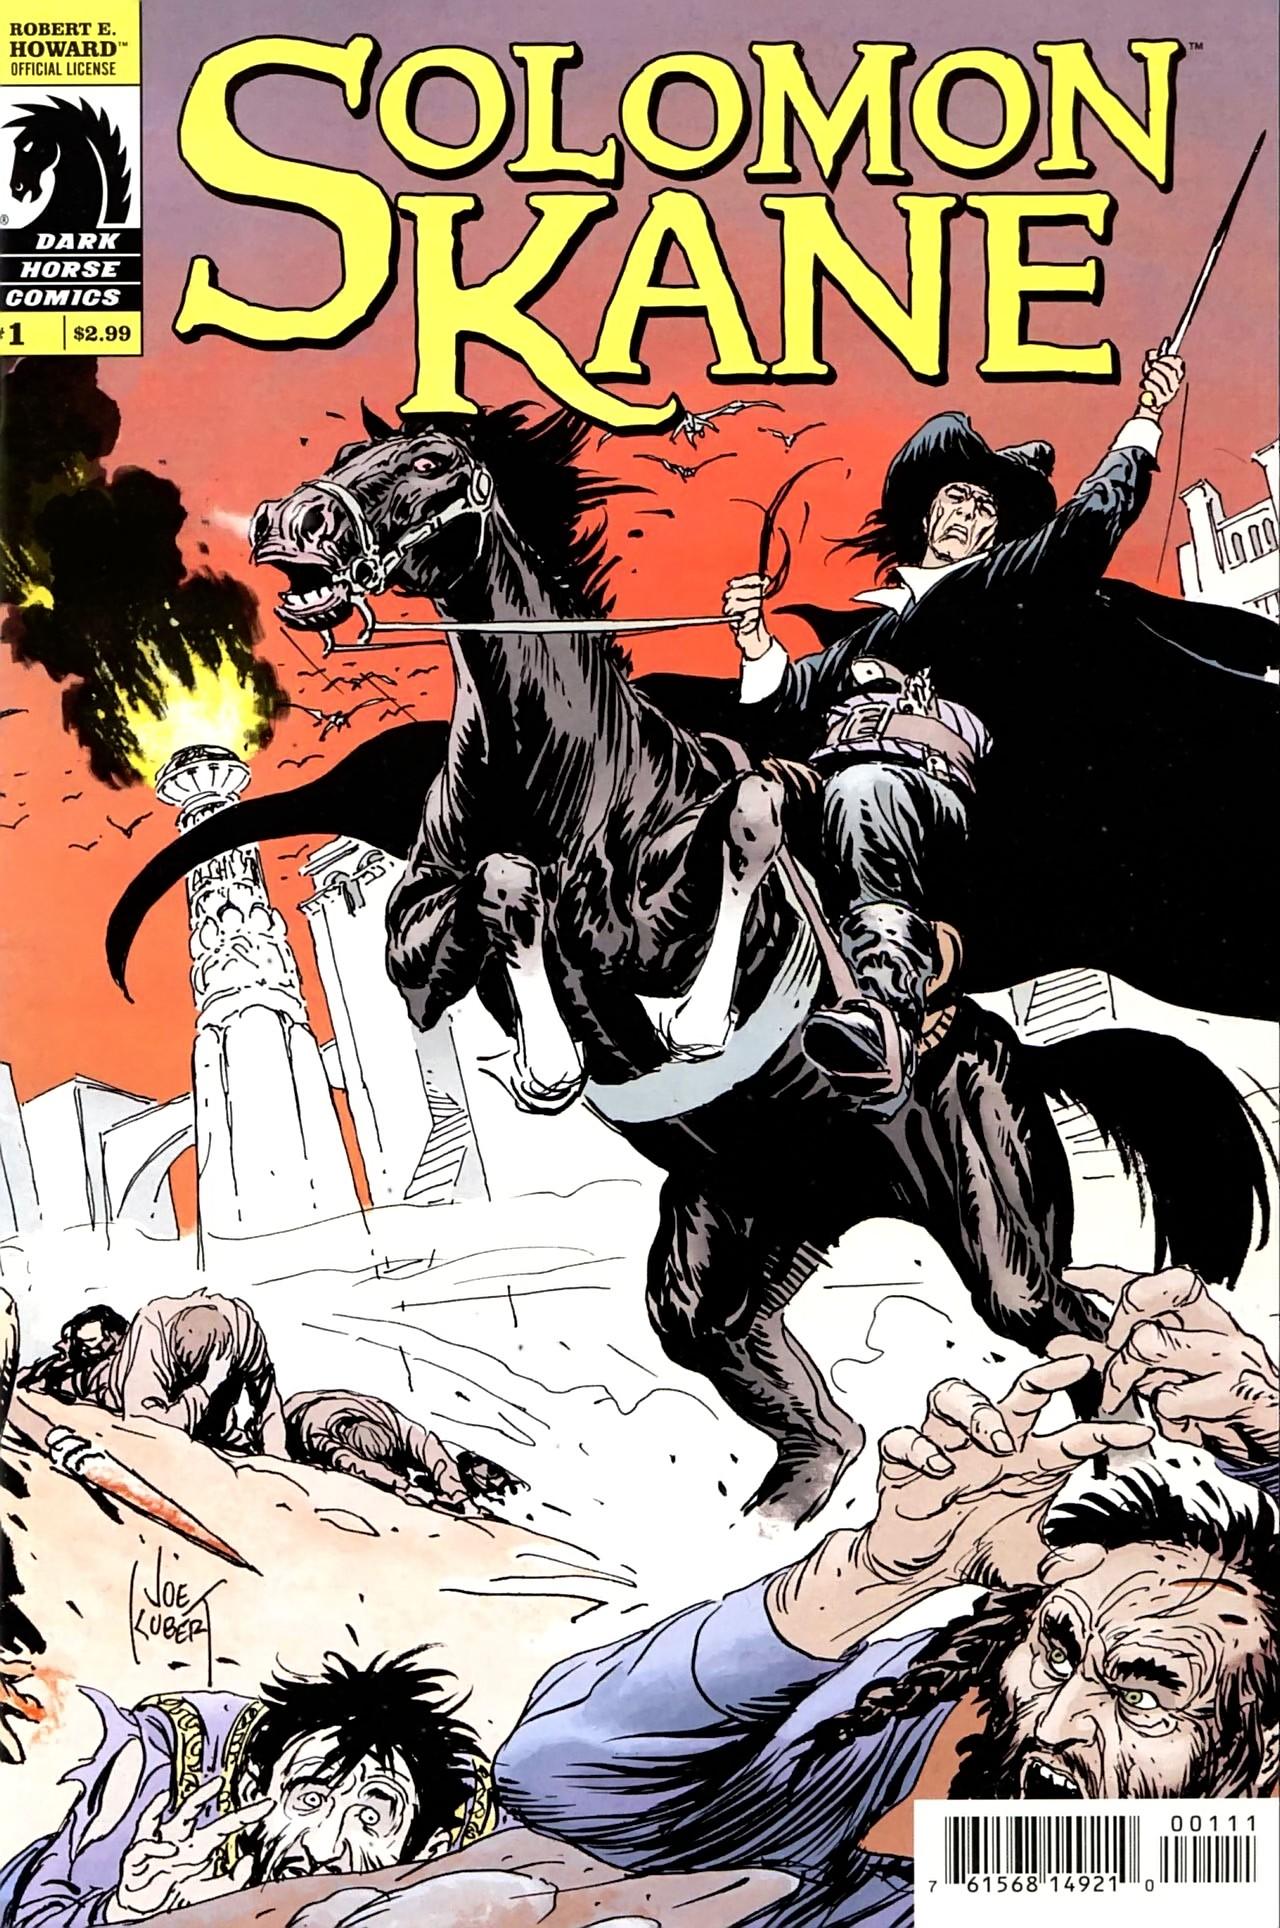 Read online Solomon Kane comic -  Issue #1 - 2